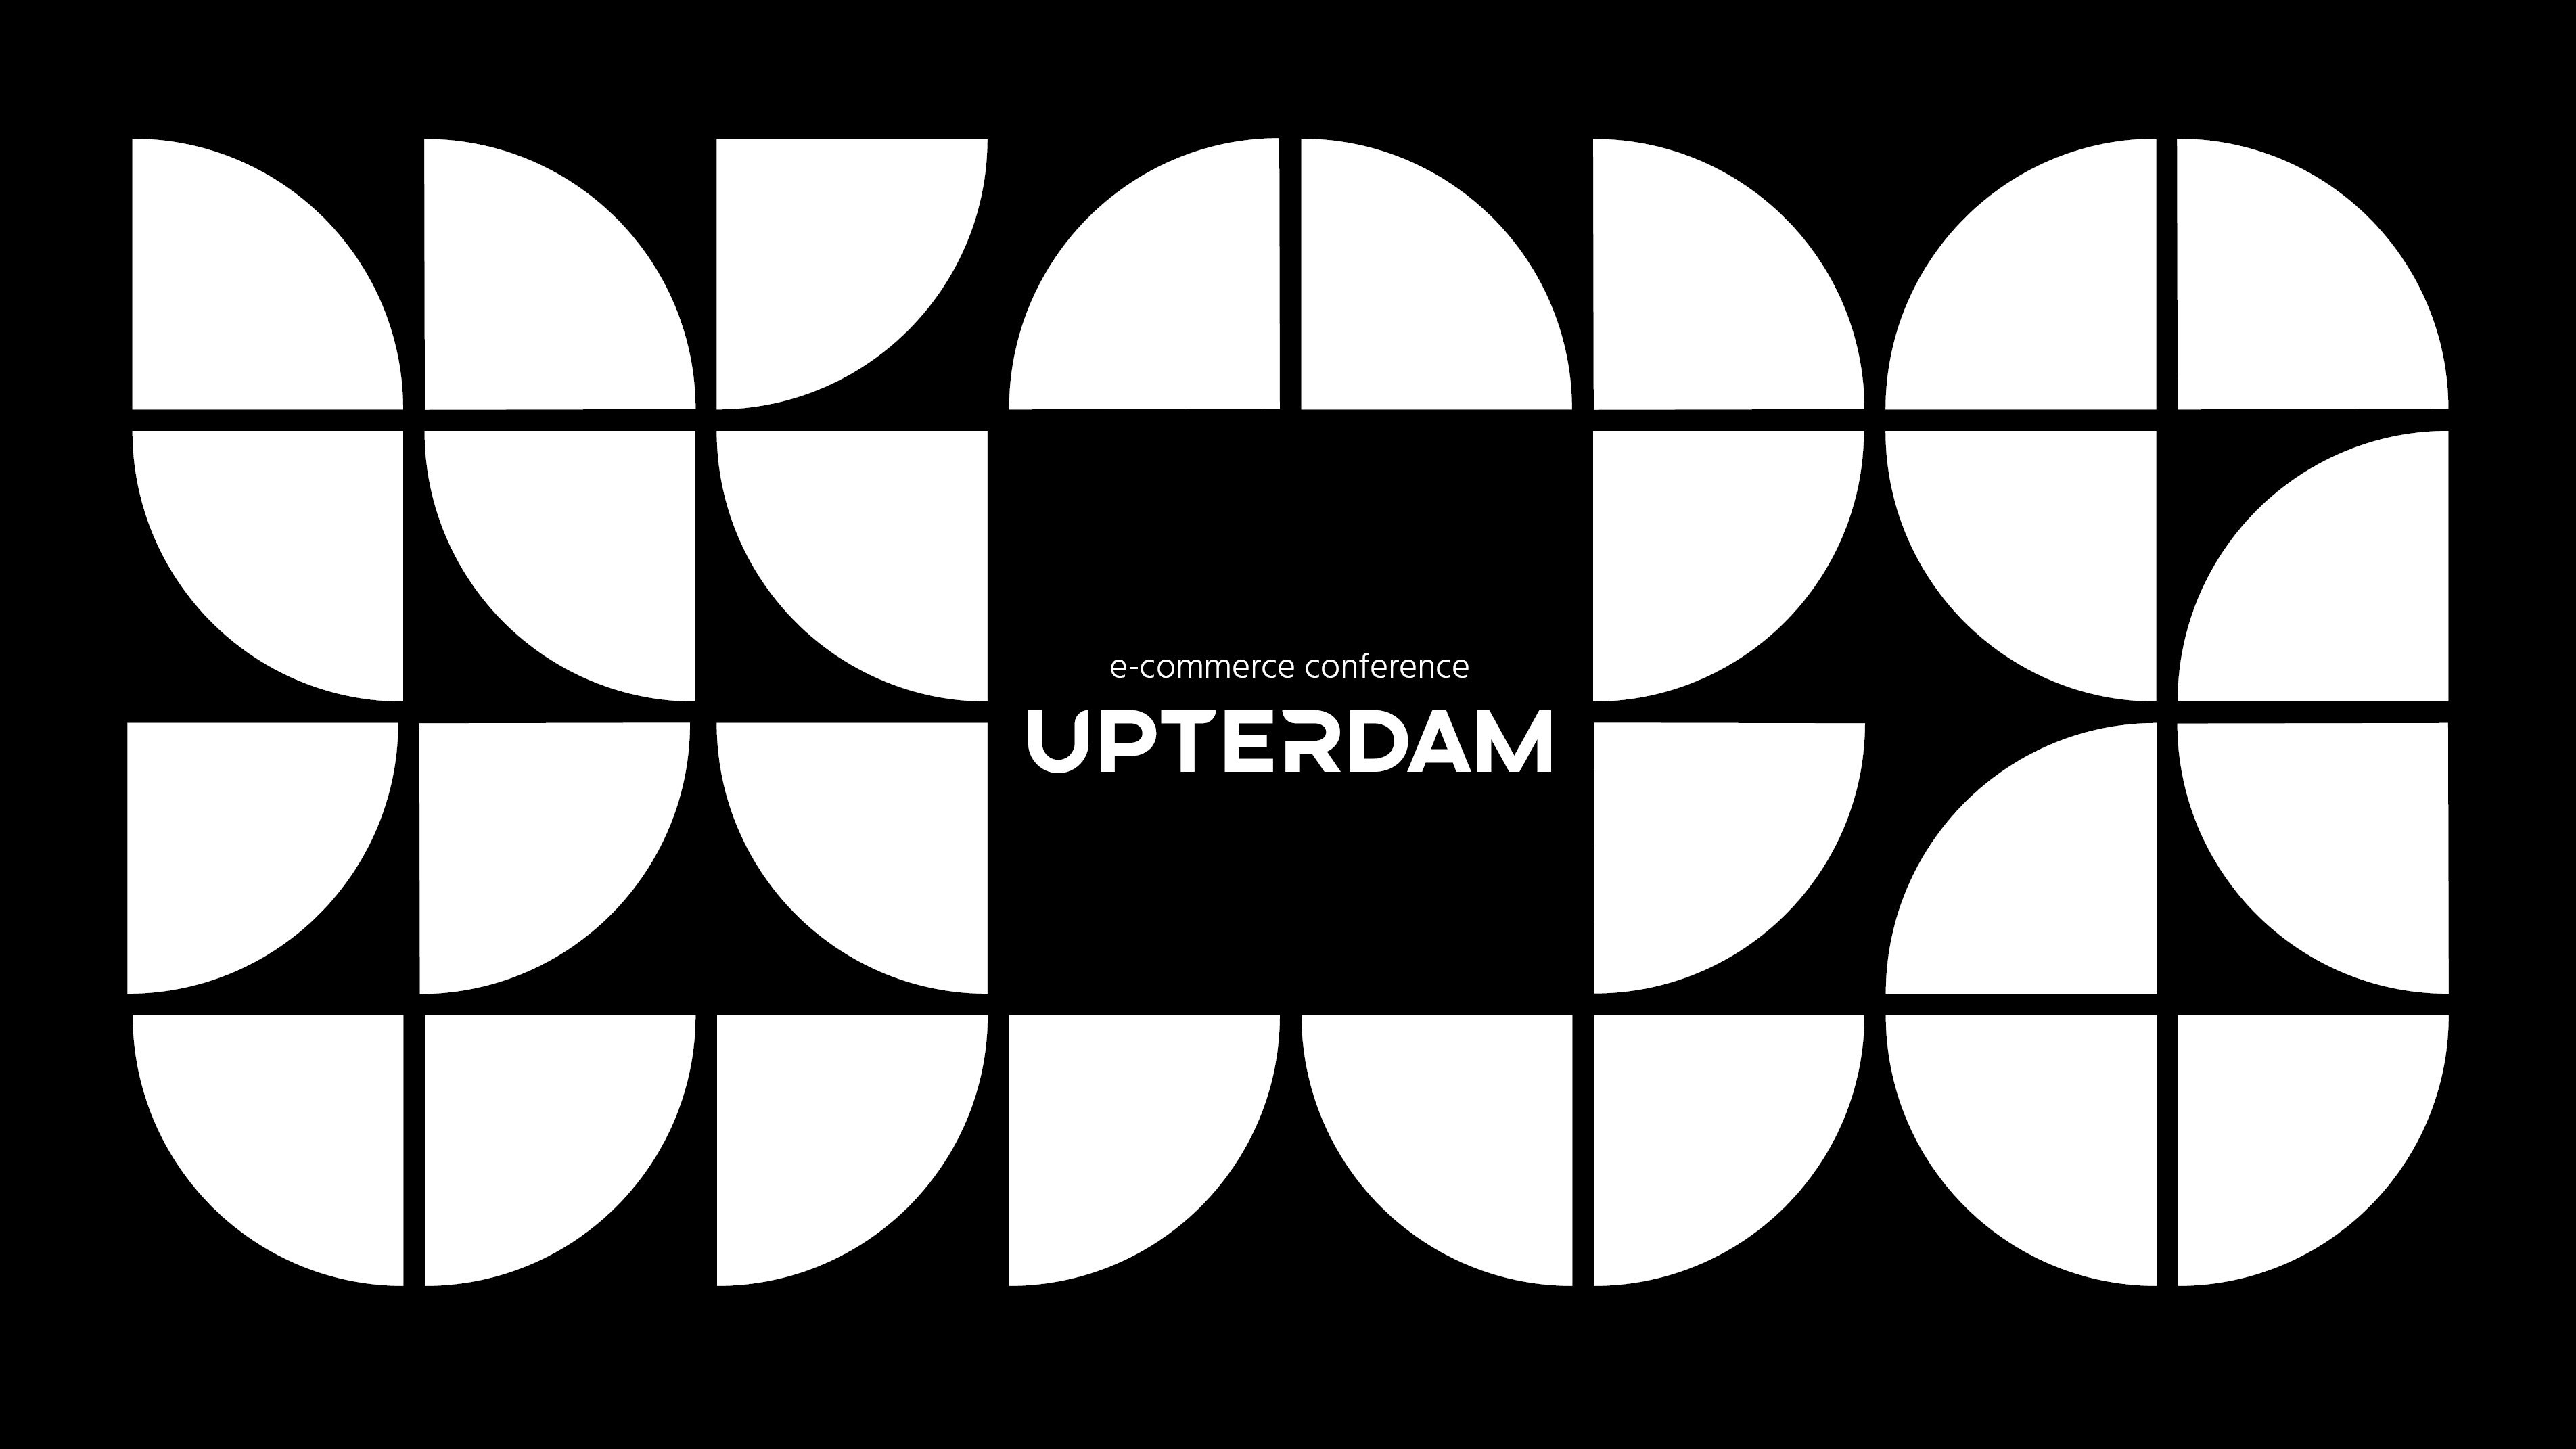 E-commerce konferencia Upterdam a webináre pre e-shopárov